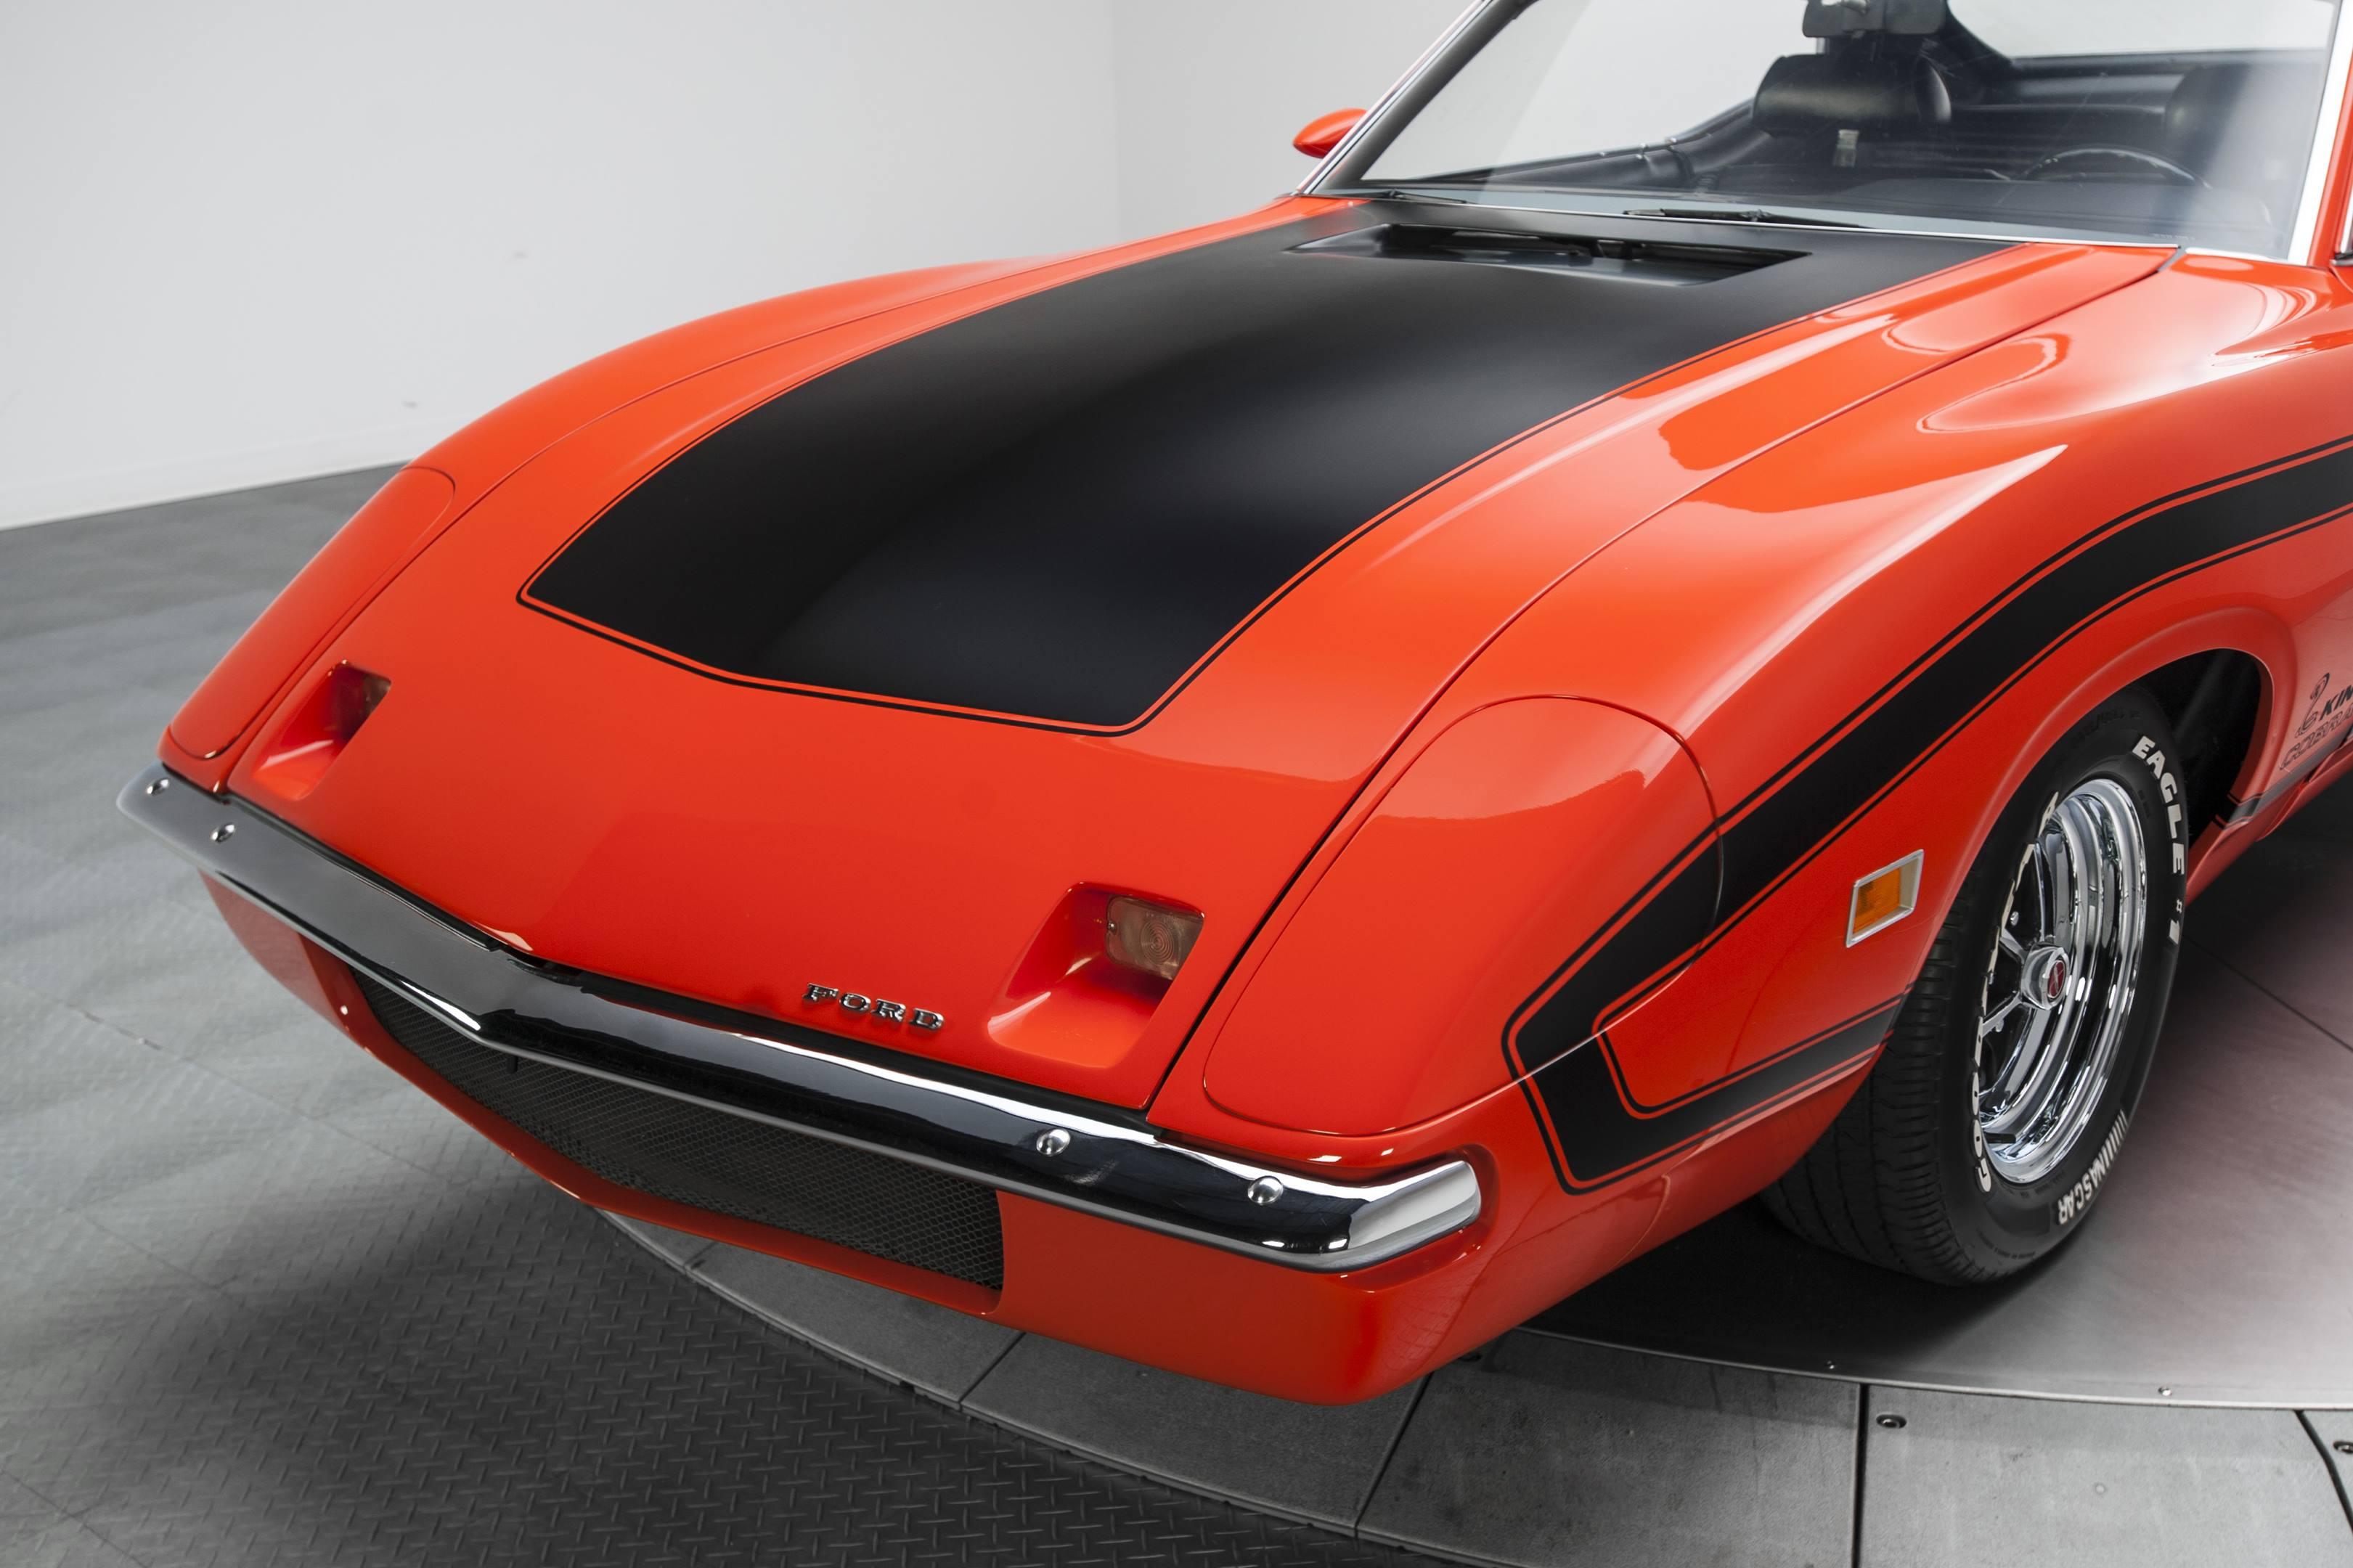 Ford Torino King Cobra hood detail